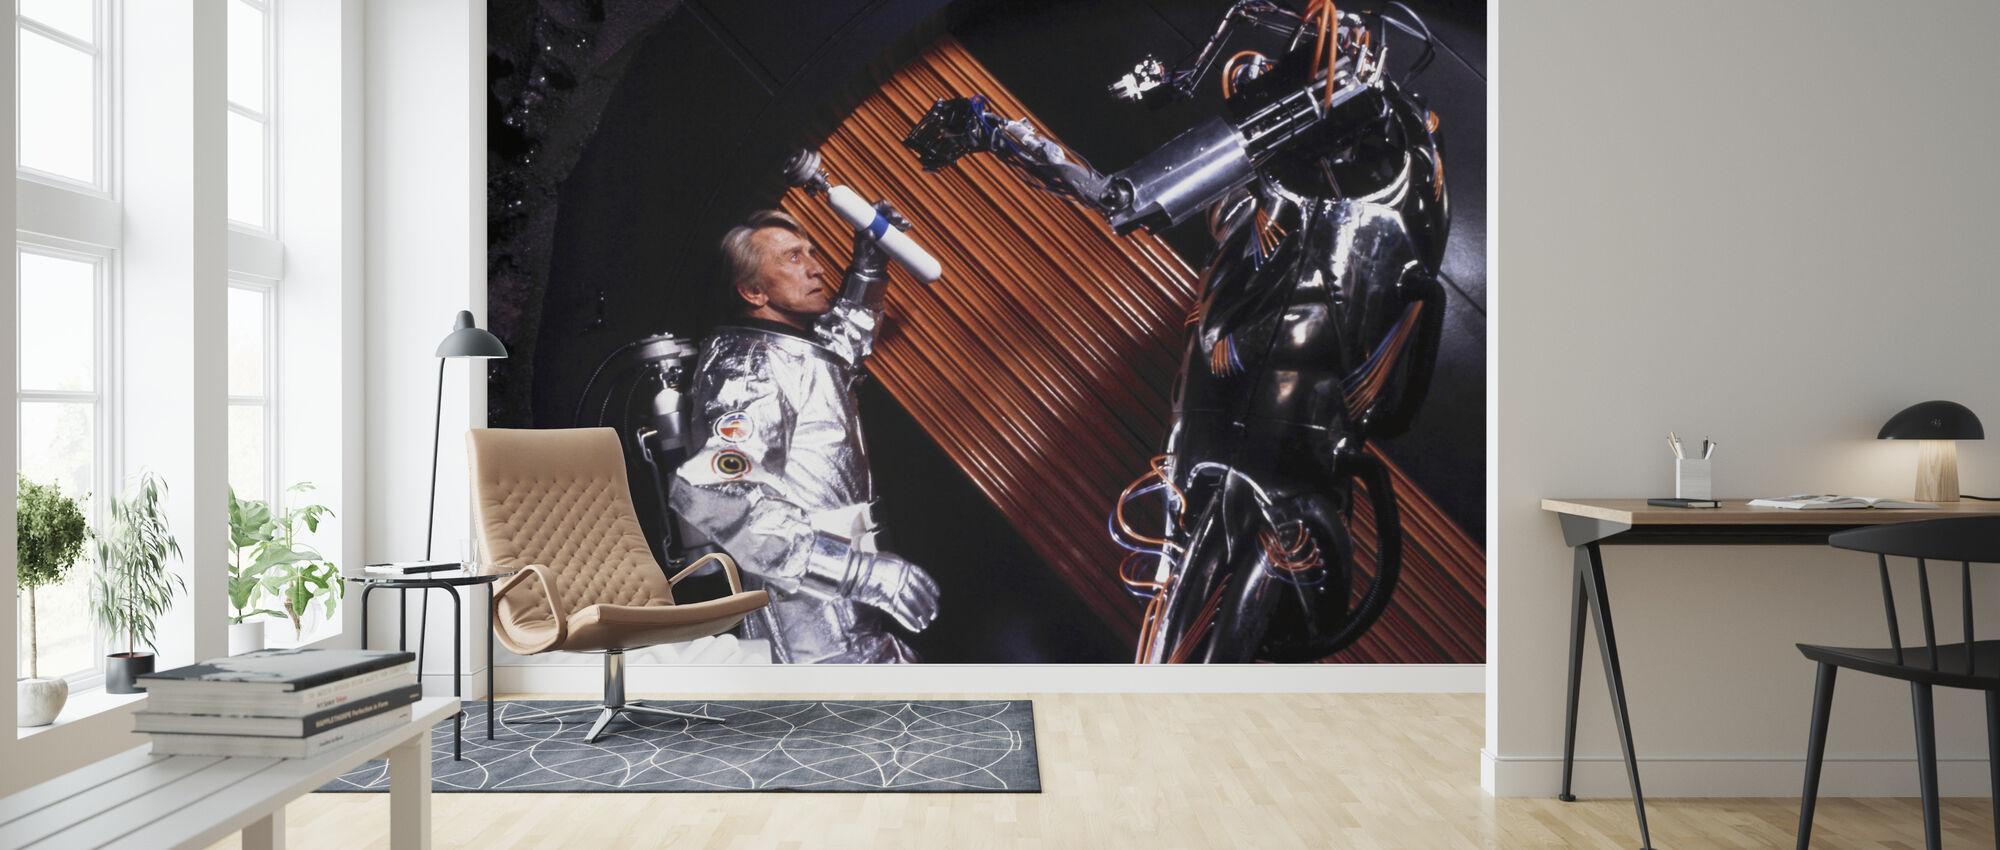 Saturn 3 - Kirk Douglas - Wallpaper - Living Room